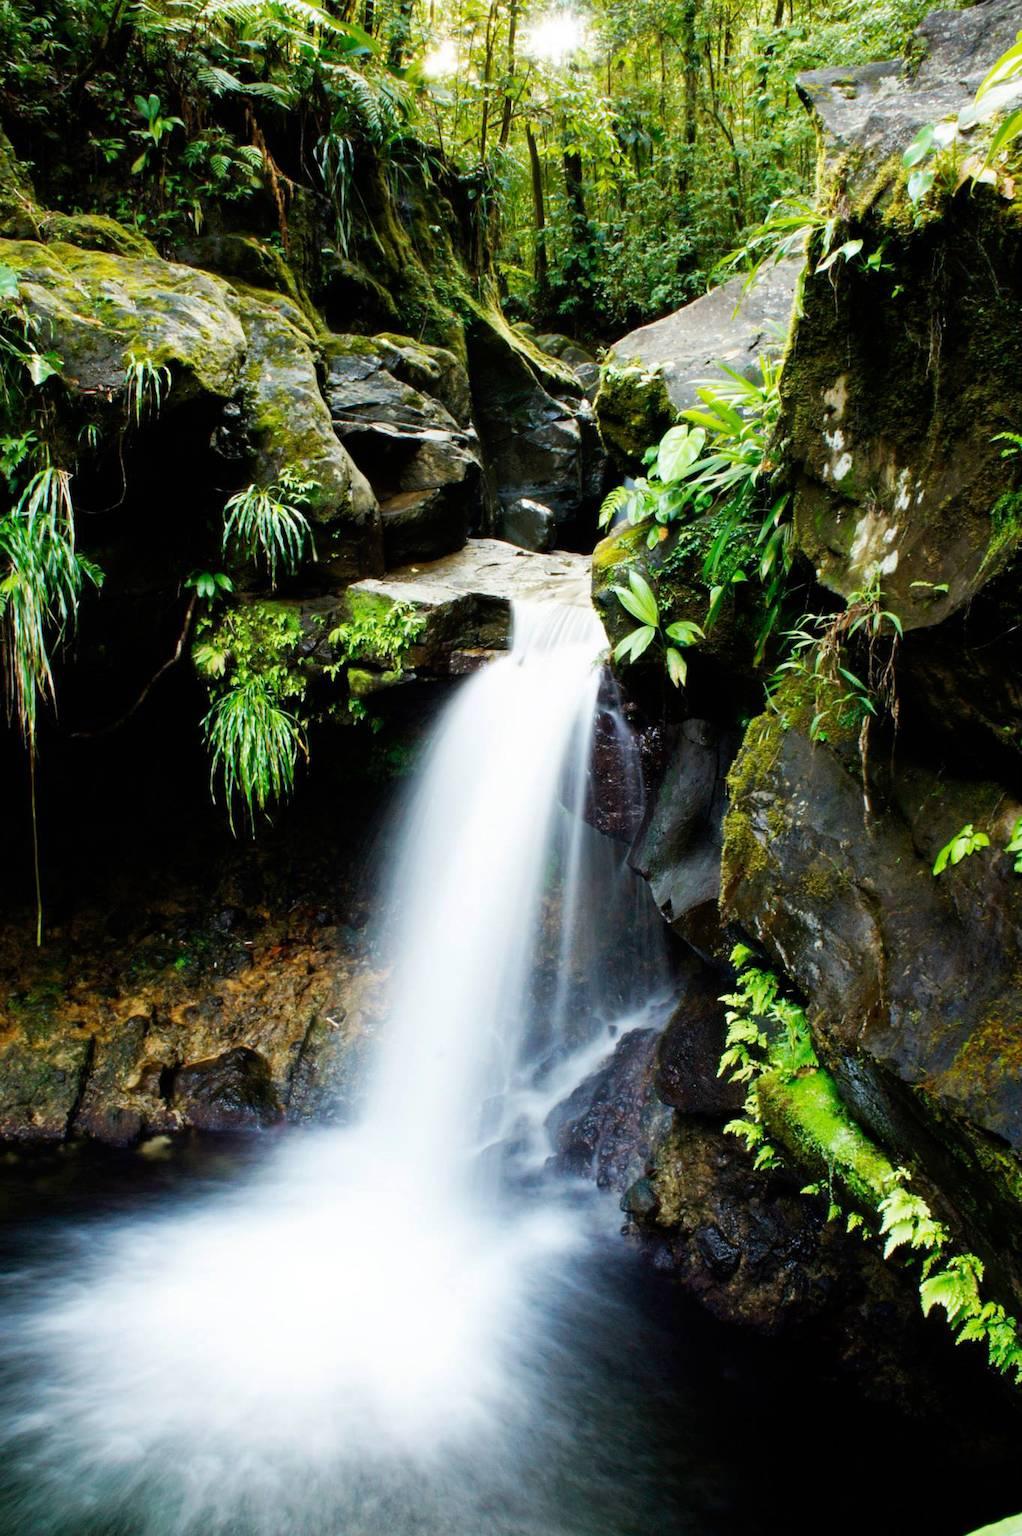 Photo 3: Cascade Paradise